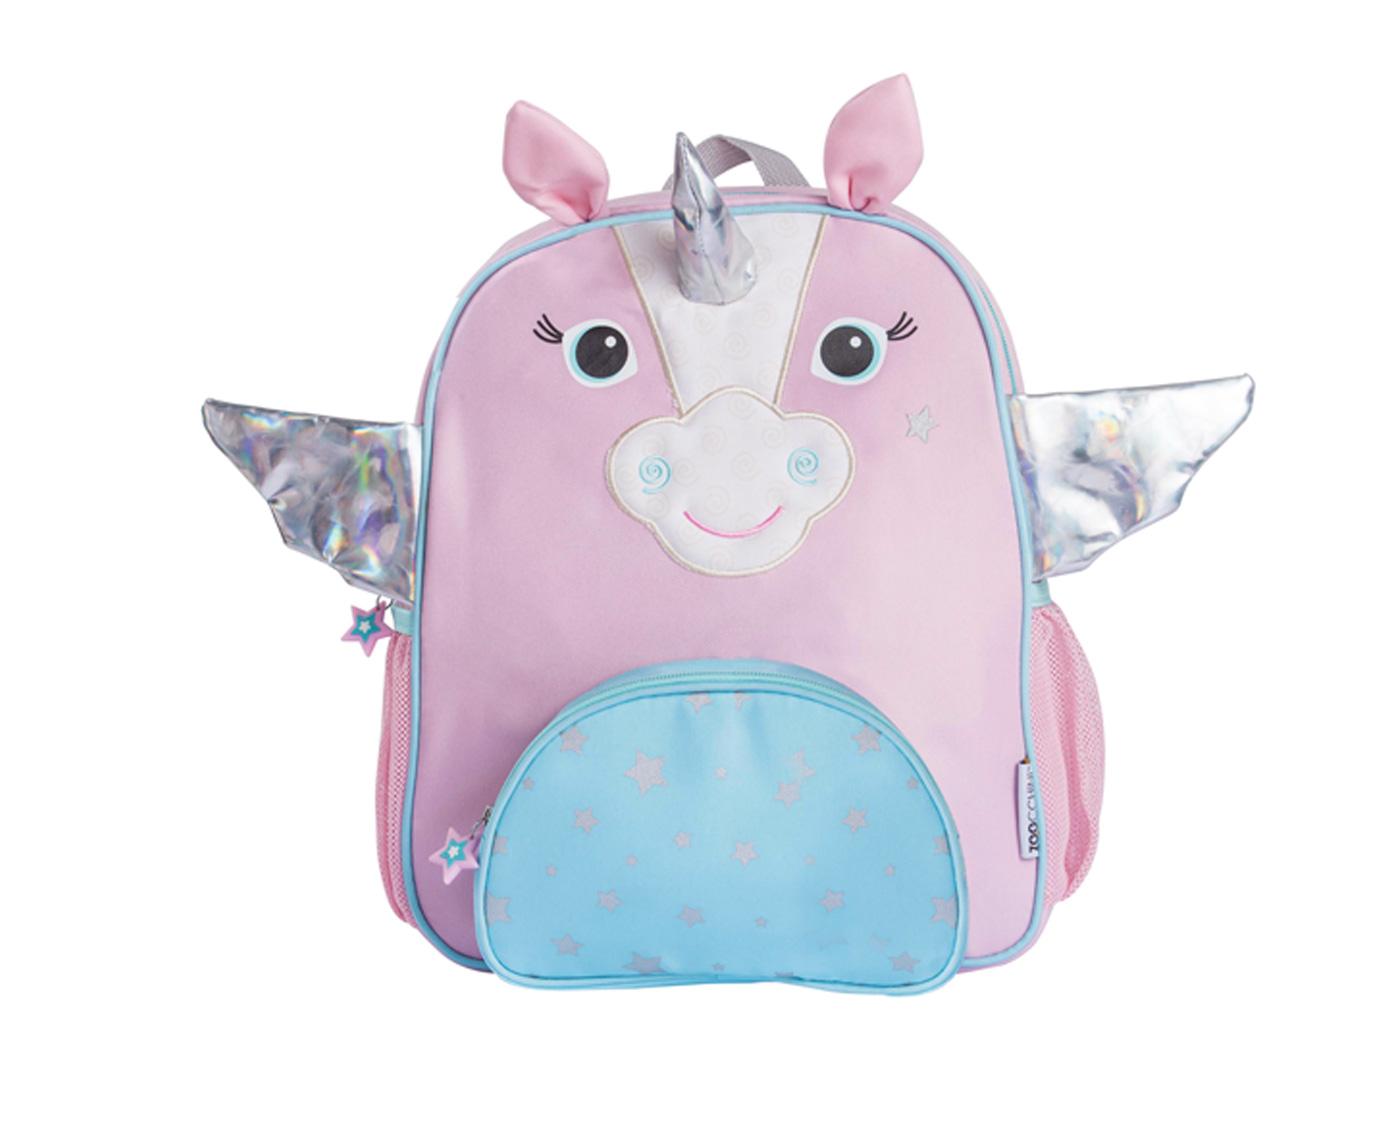 Rugzak 'Unicorn' kleur